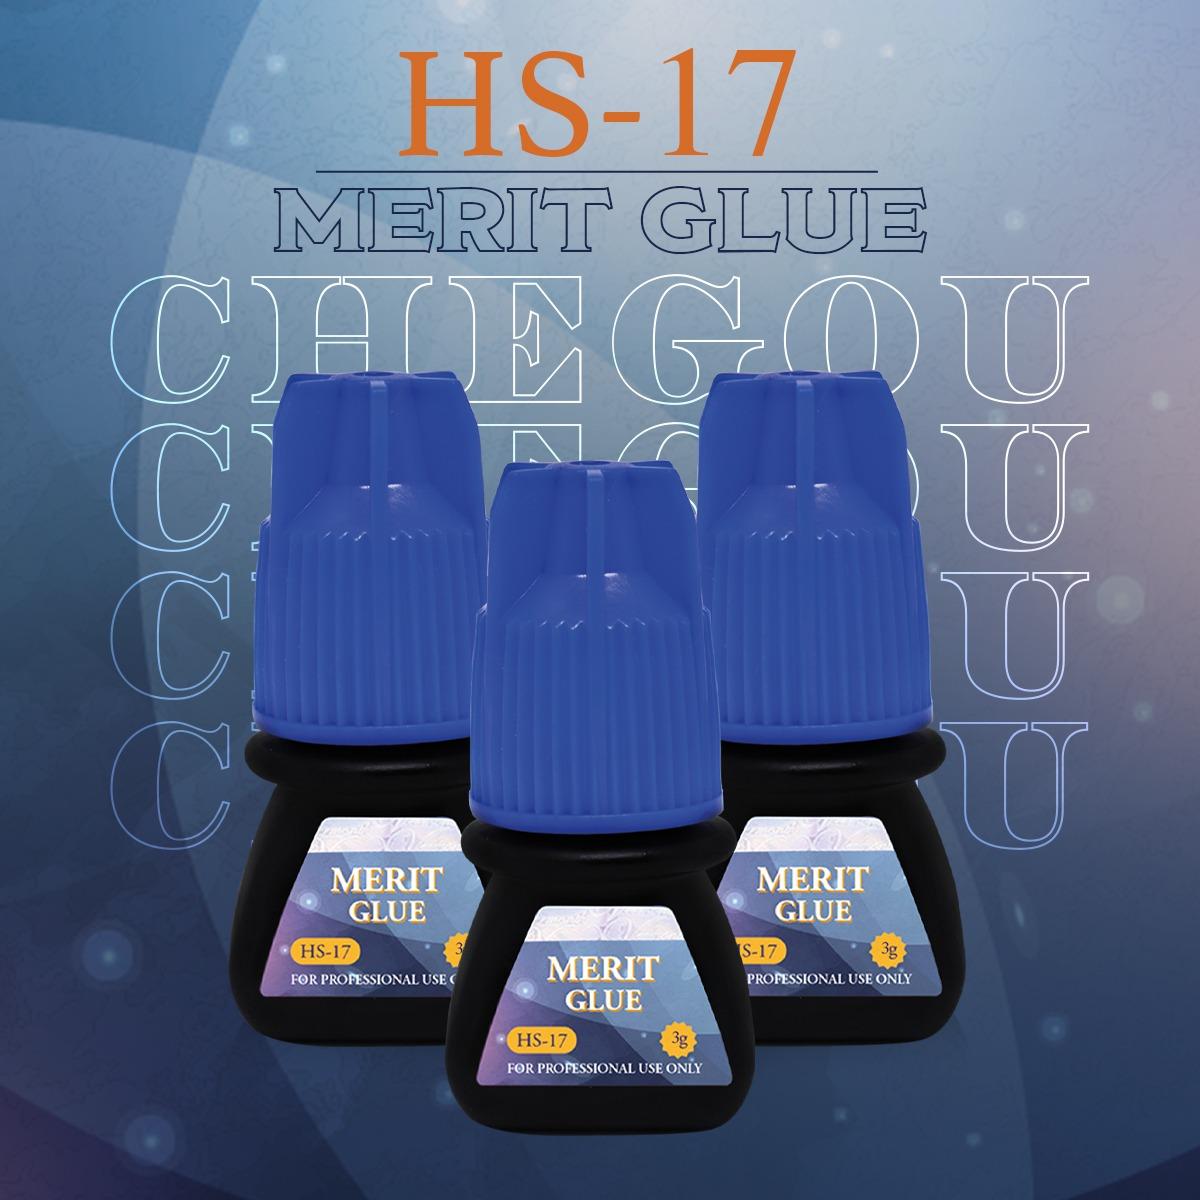 Cola HS-17 Merit Glue para Extensão de Cílios 3ml